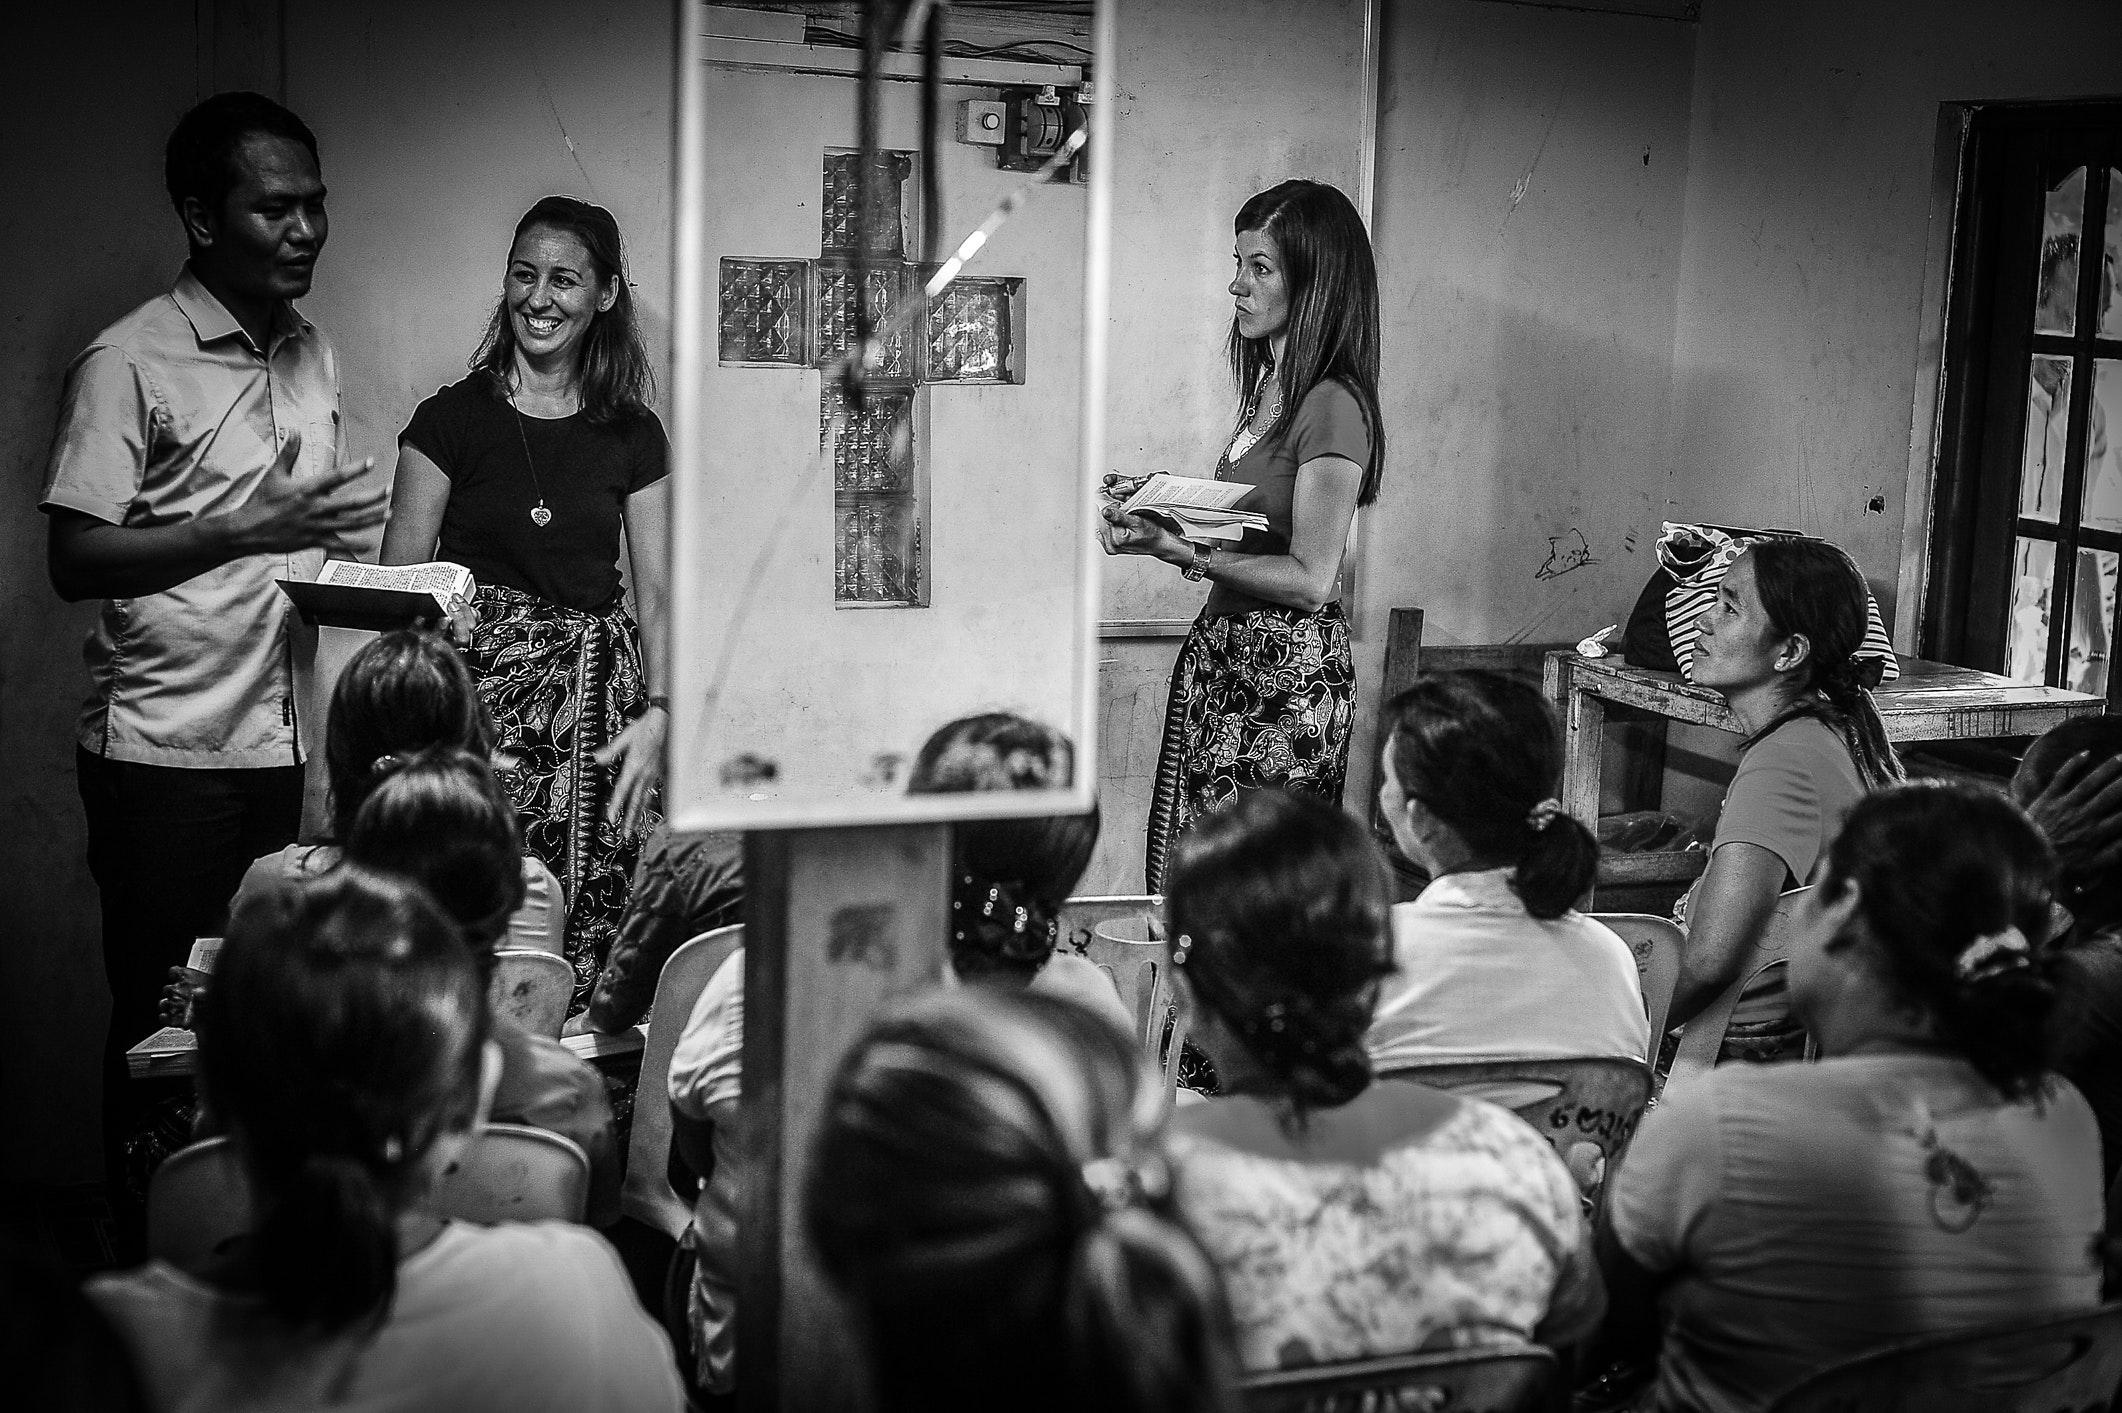 White Framed Rectangular Mirror, Black-and-white, People, Teacher, Talking, HQ Photo